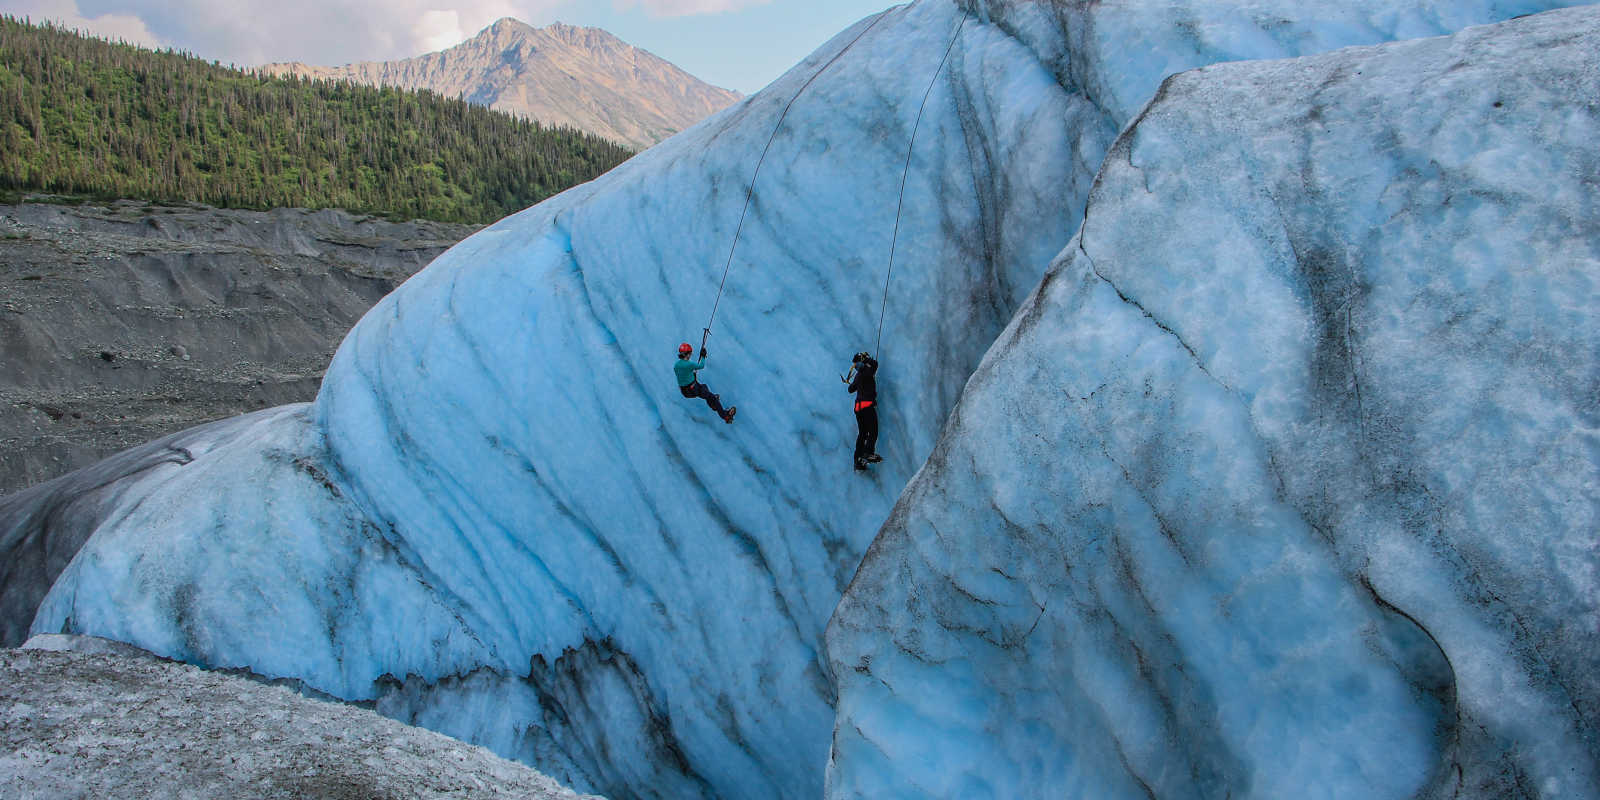 Ice climbing tours in Wrangell Saint Elias National Park